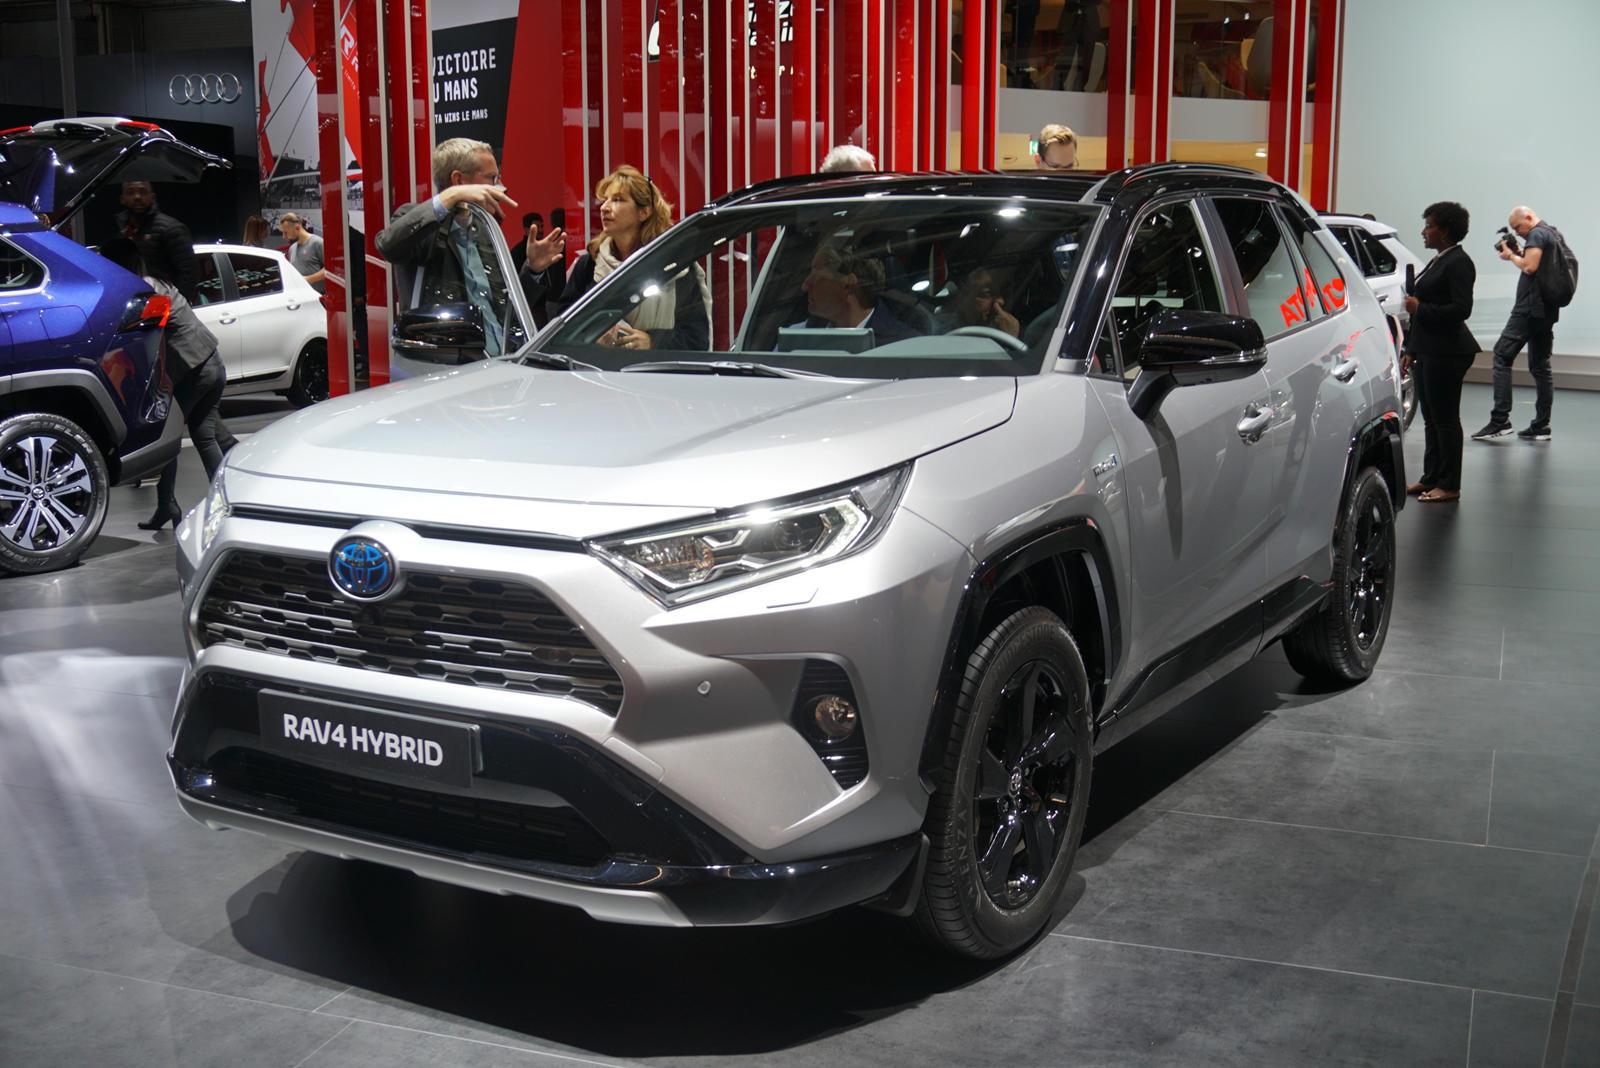 Rav4 Towing Capacity >> 2019 Toyota RAV4 Chief Engineer: Gas Station Trips Every ...